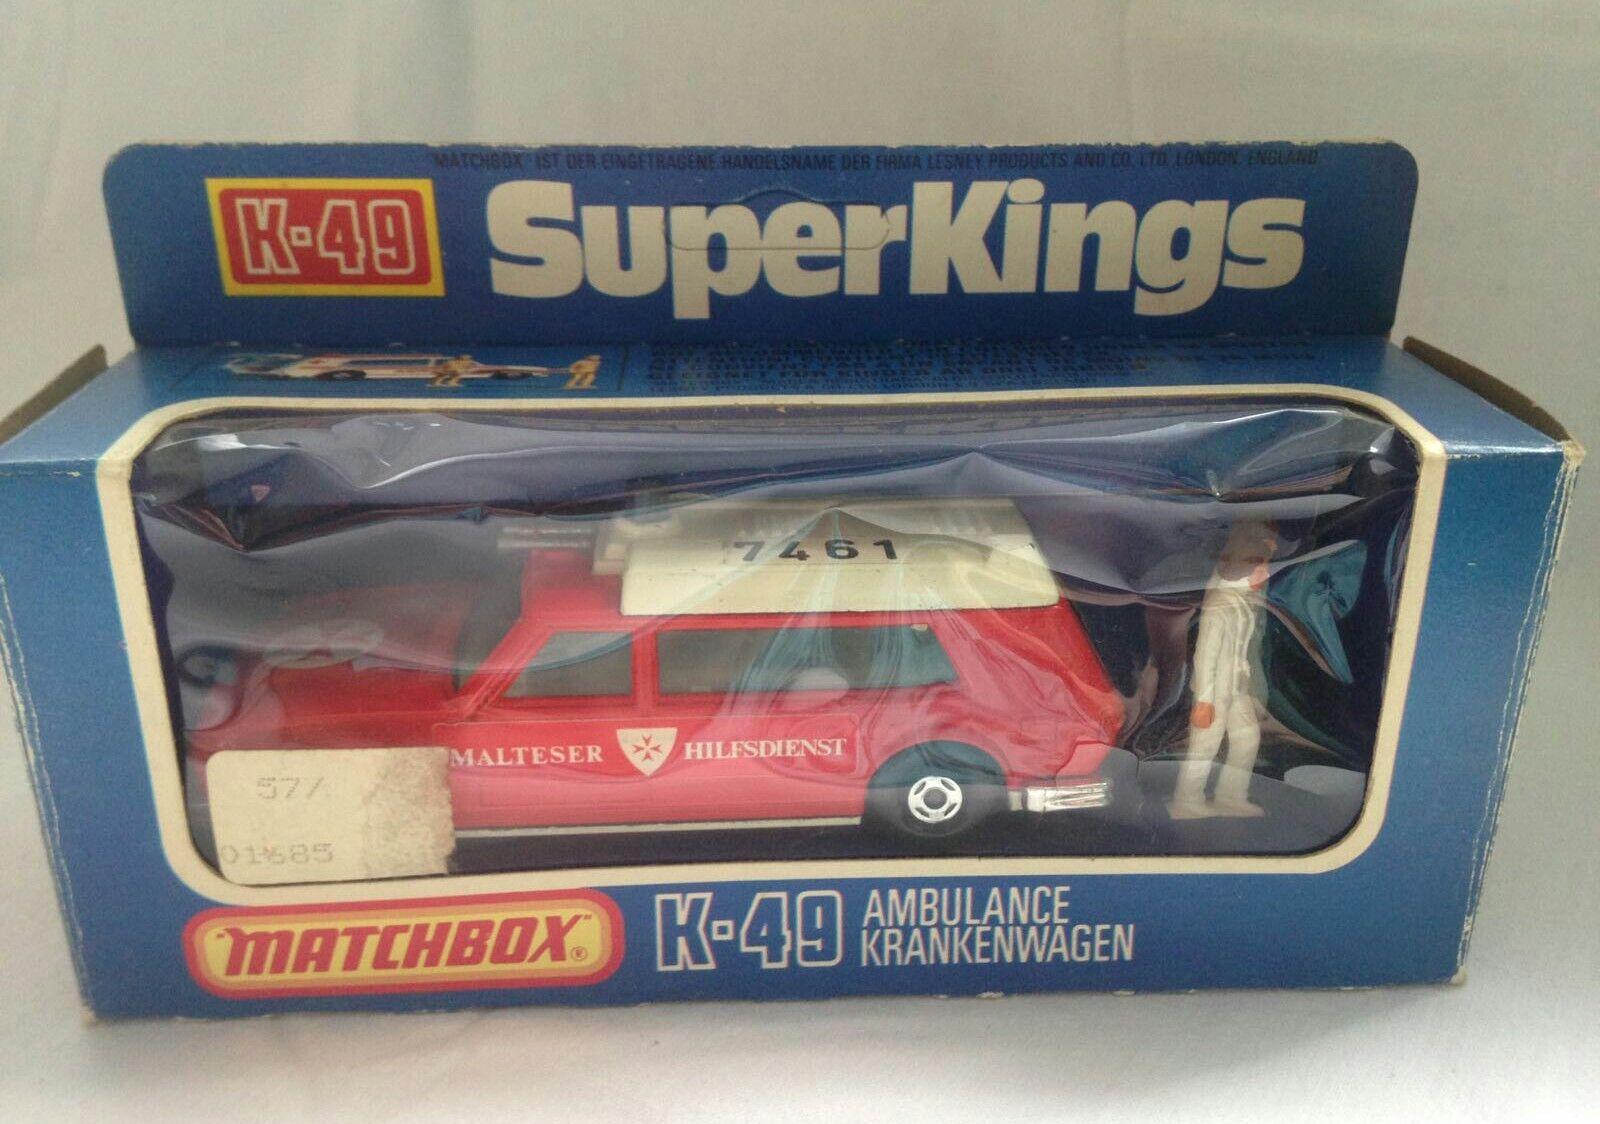 Matchbox Super Kings K-49 Ambulance Sonderotition Malteser Hilfsdienst in OV